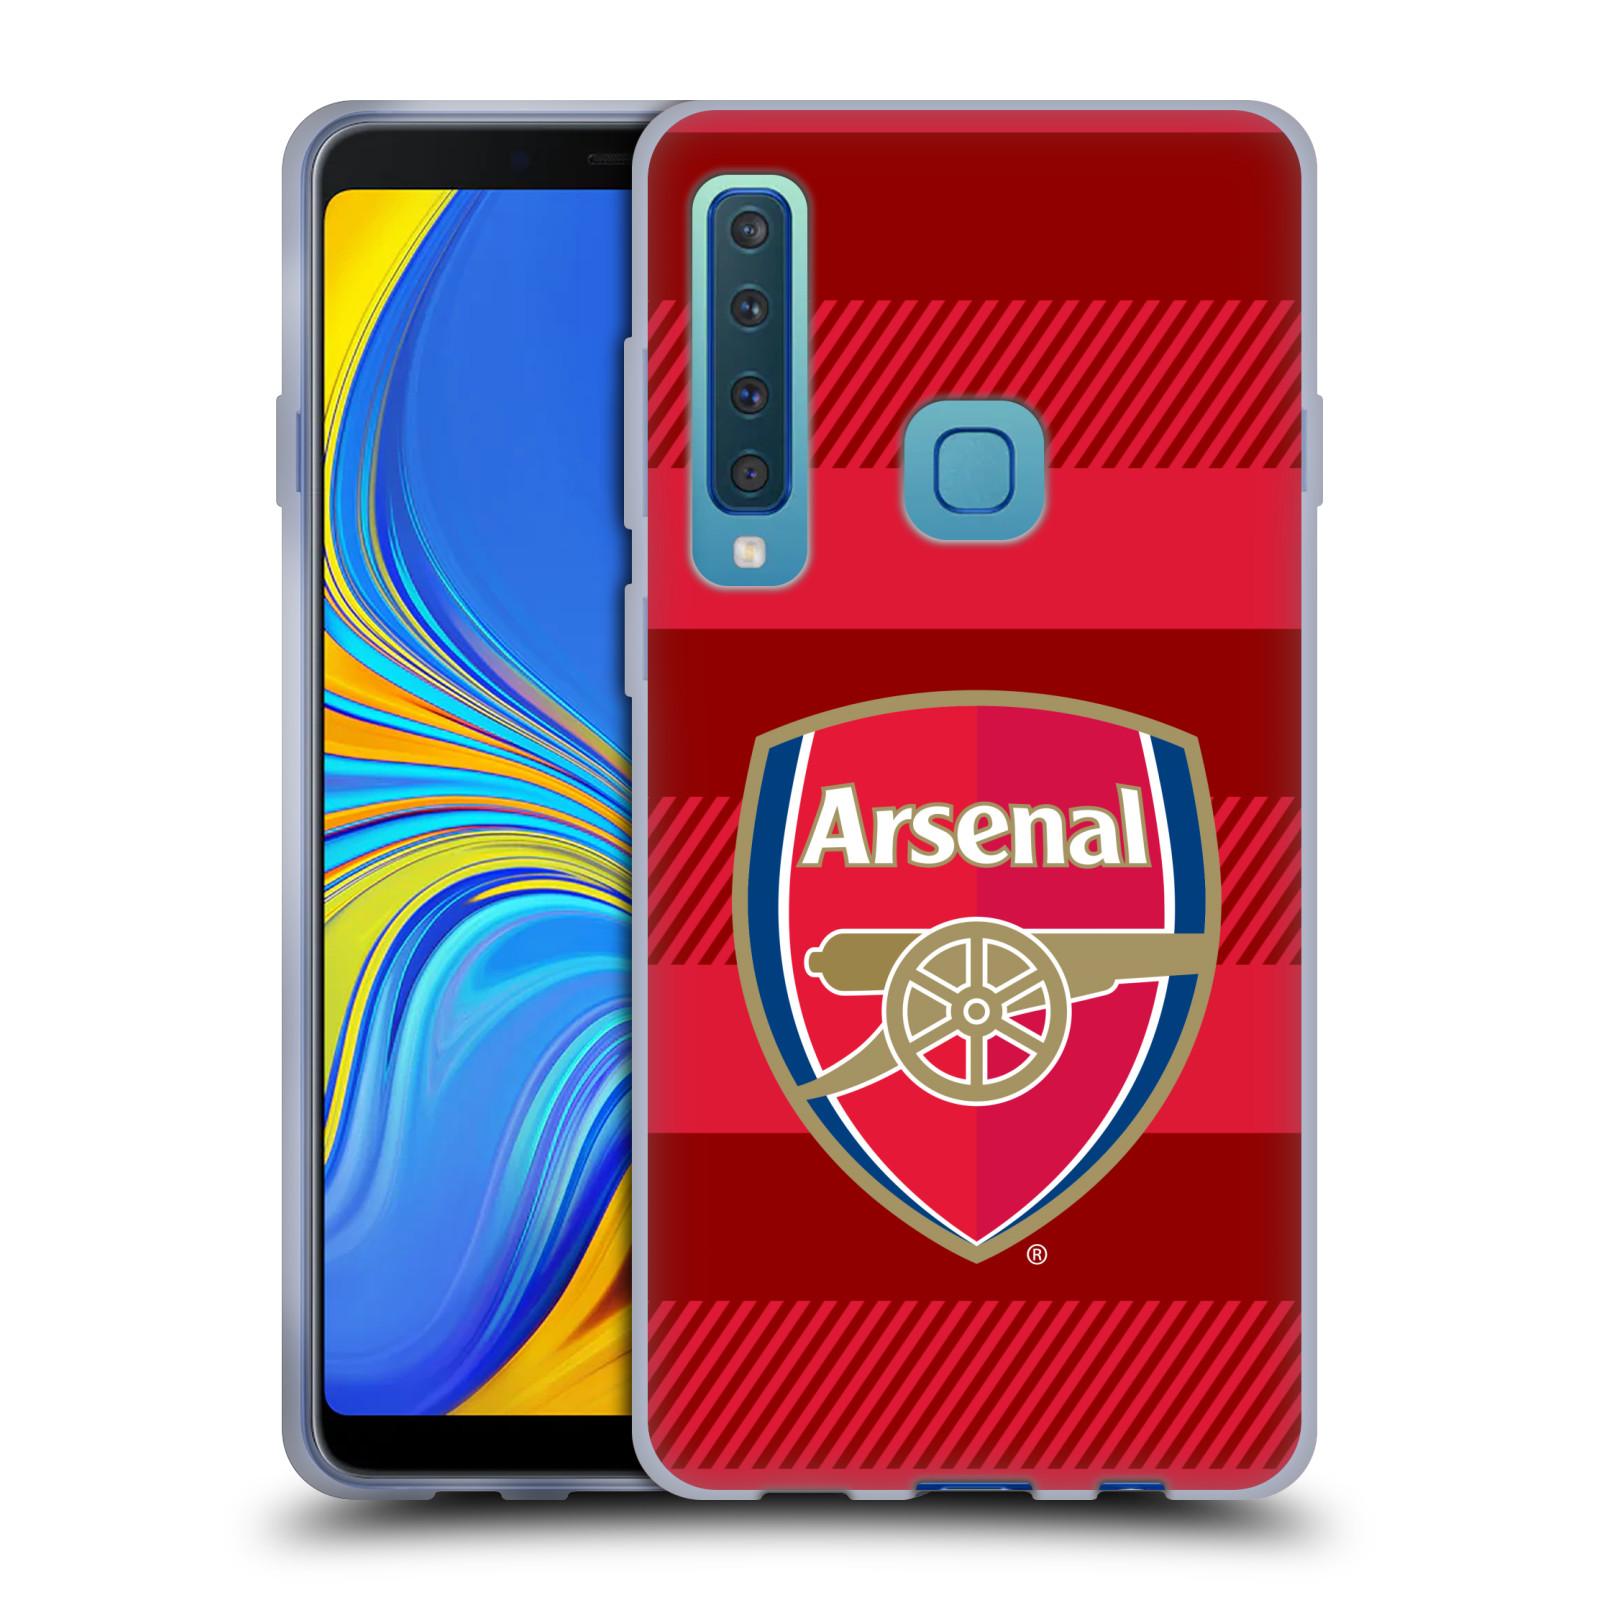 Silikonové pouzdro na mobil Samsung Galaxy A9 (2018) - Head Case - Arsenal FC - Logo s pruhy